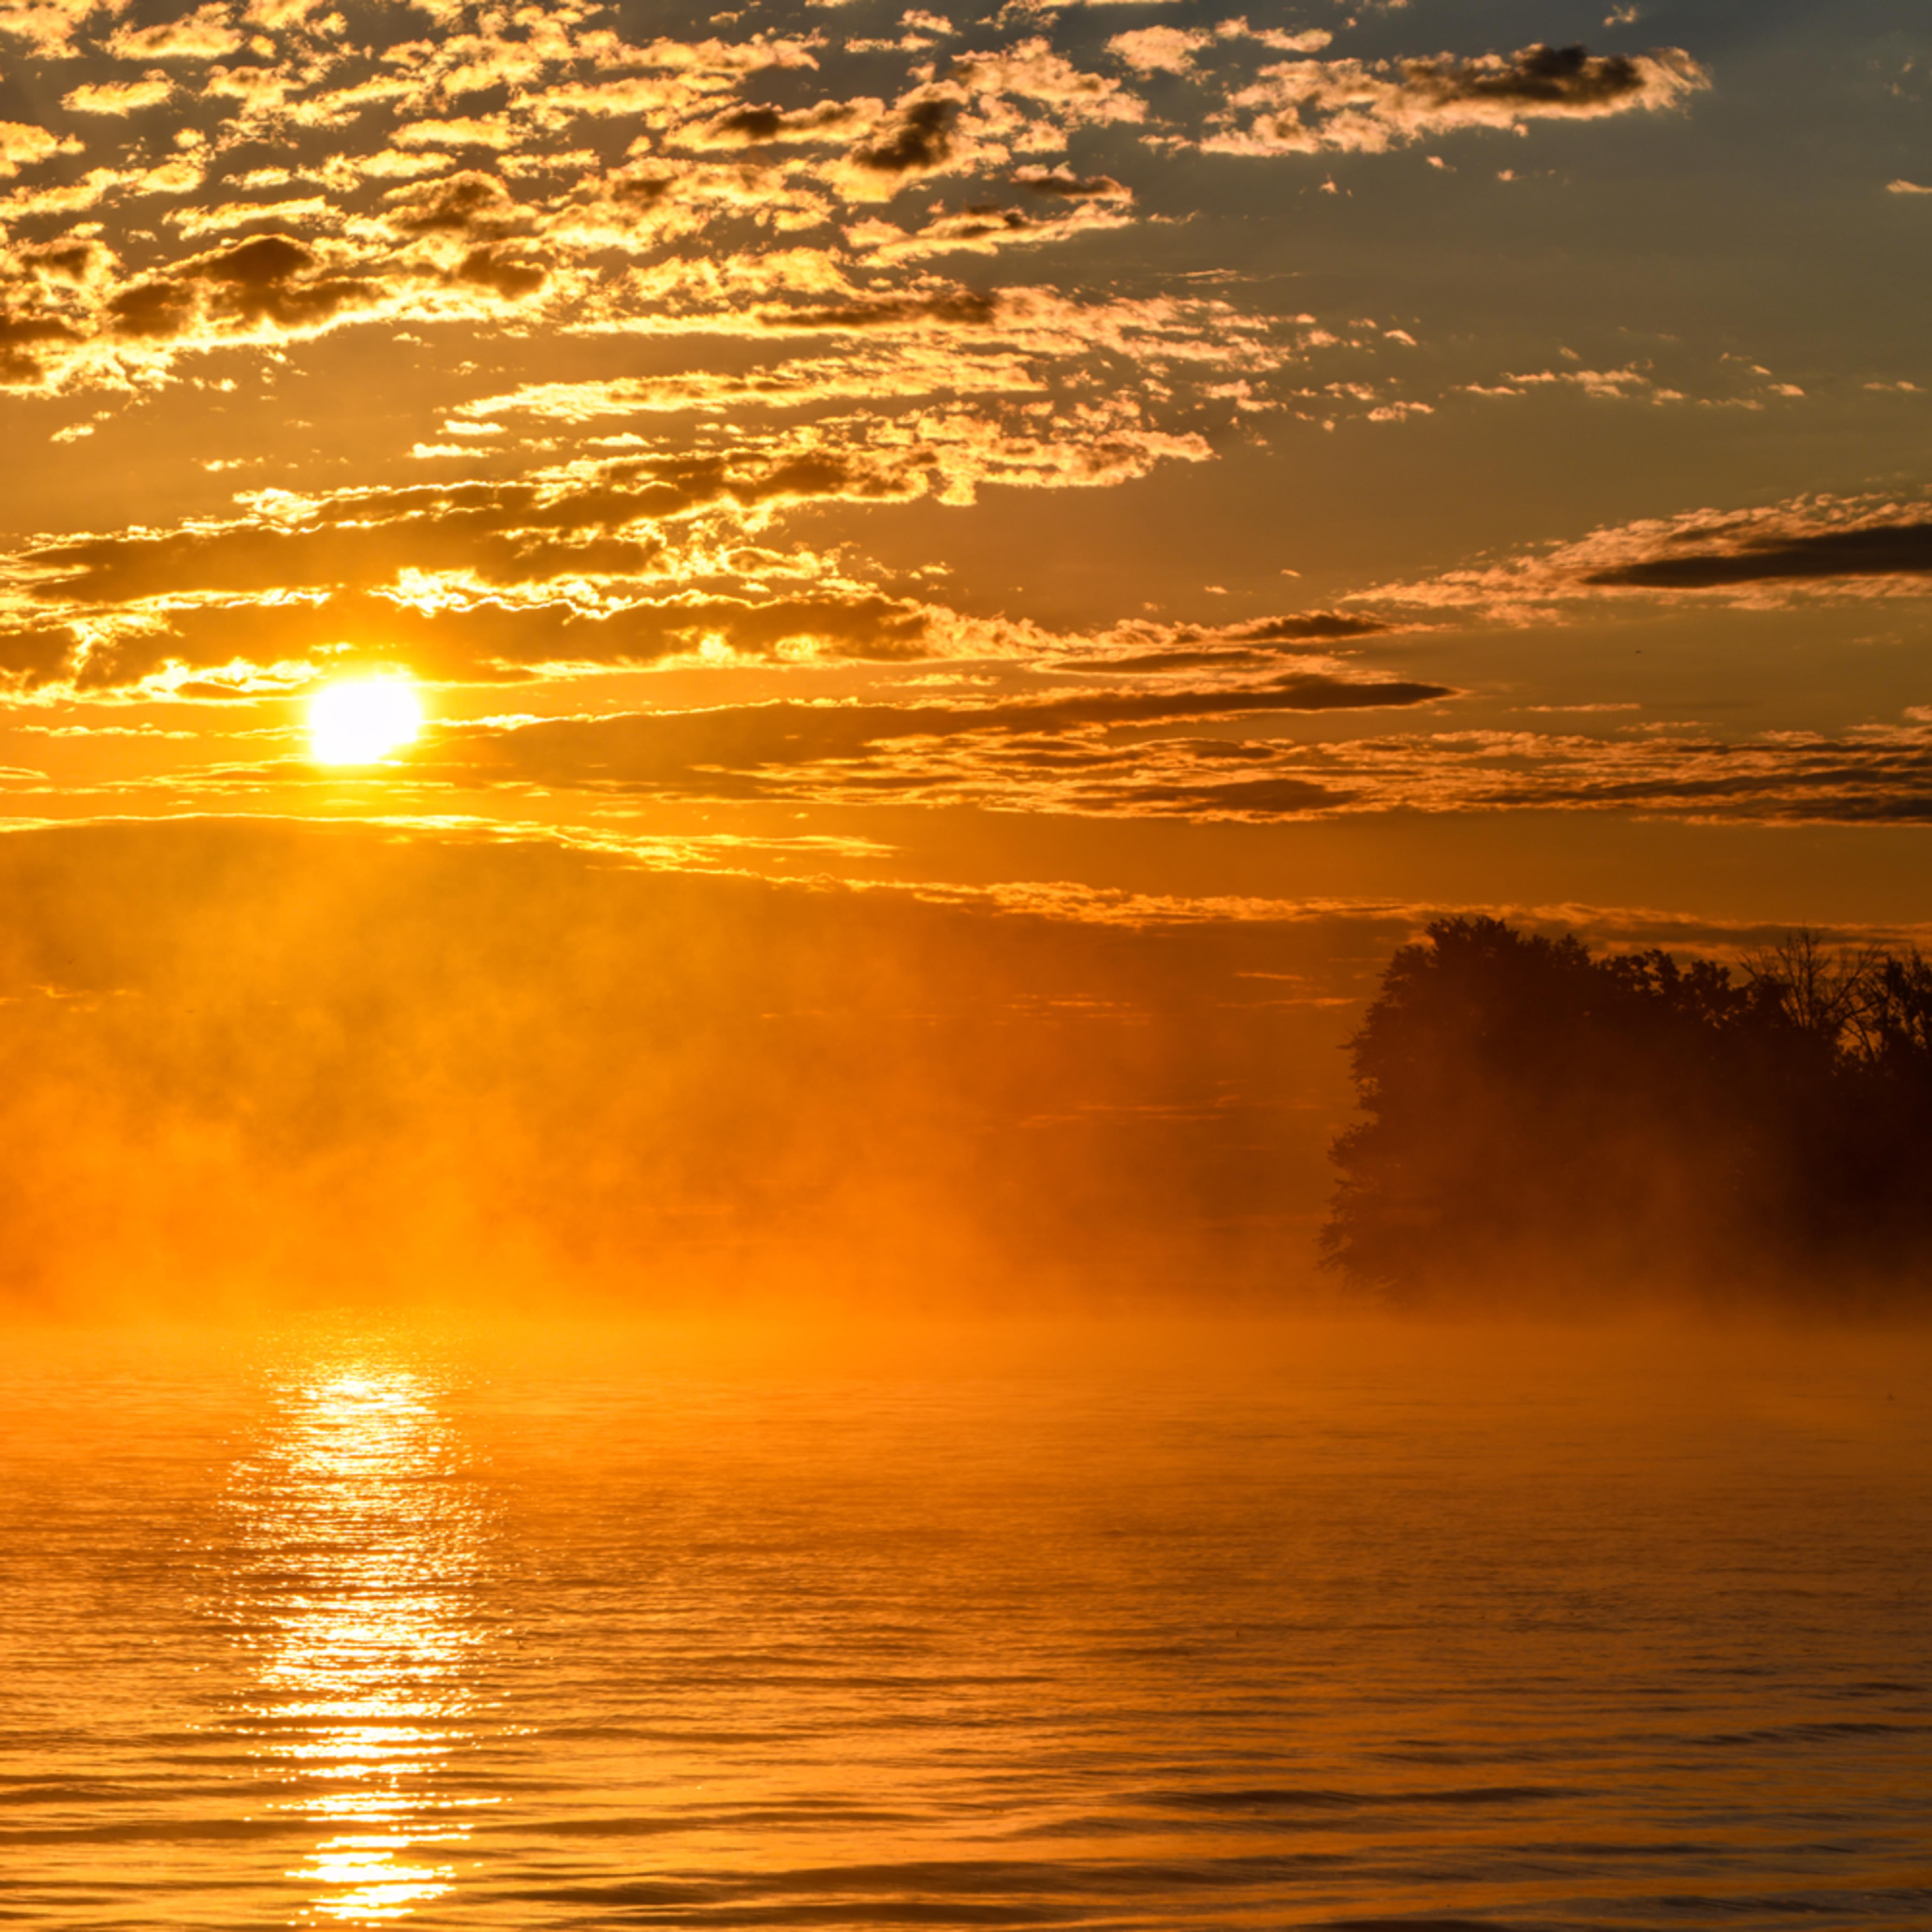 Andy crawford photography oneida lake sunrise 1 h3pw6s